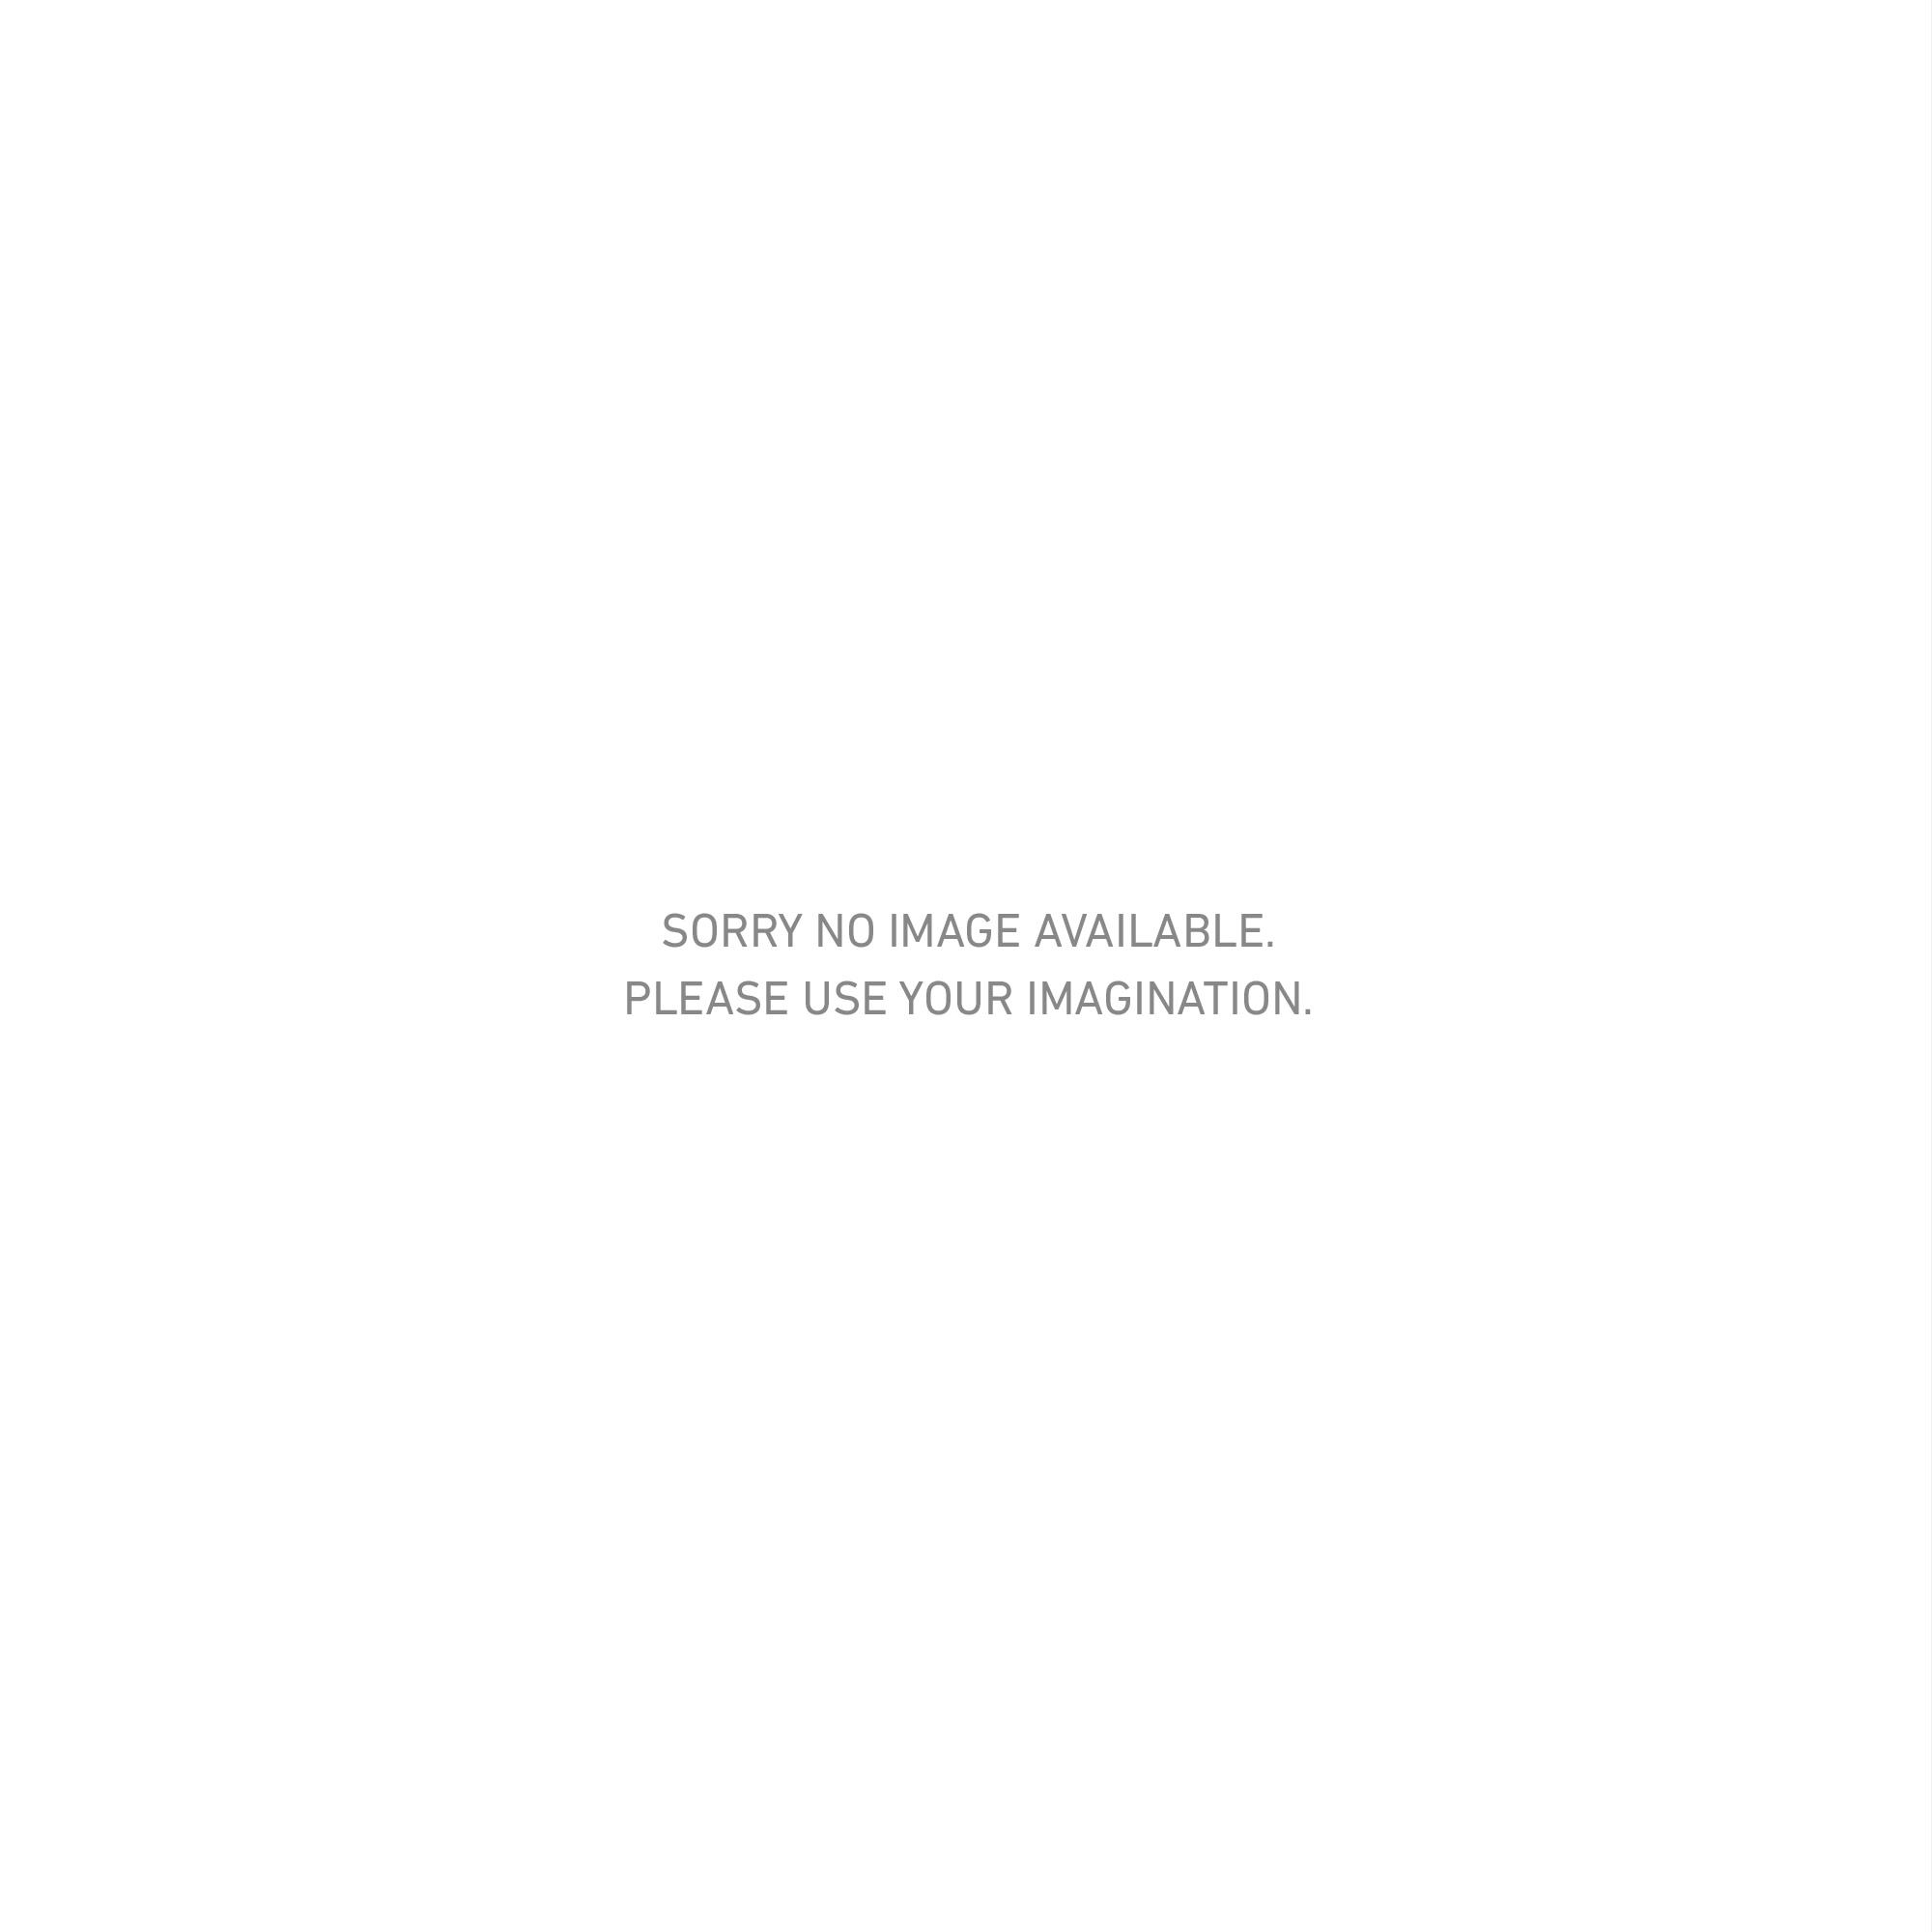 9c51fd950006e Uniqlo WOMEN Striped Short Sleeve Long Bra Dress at £24.9